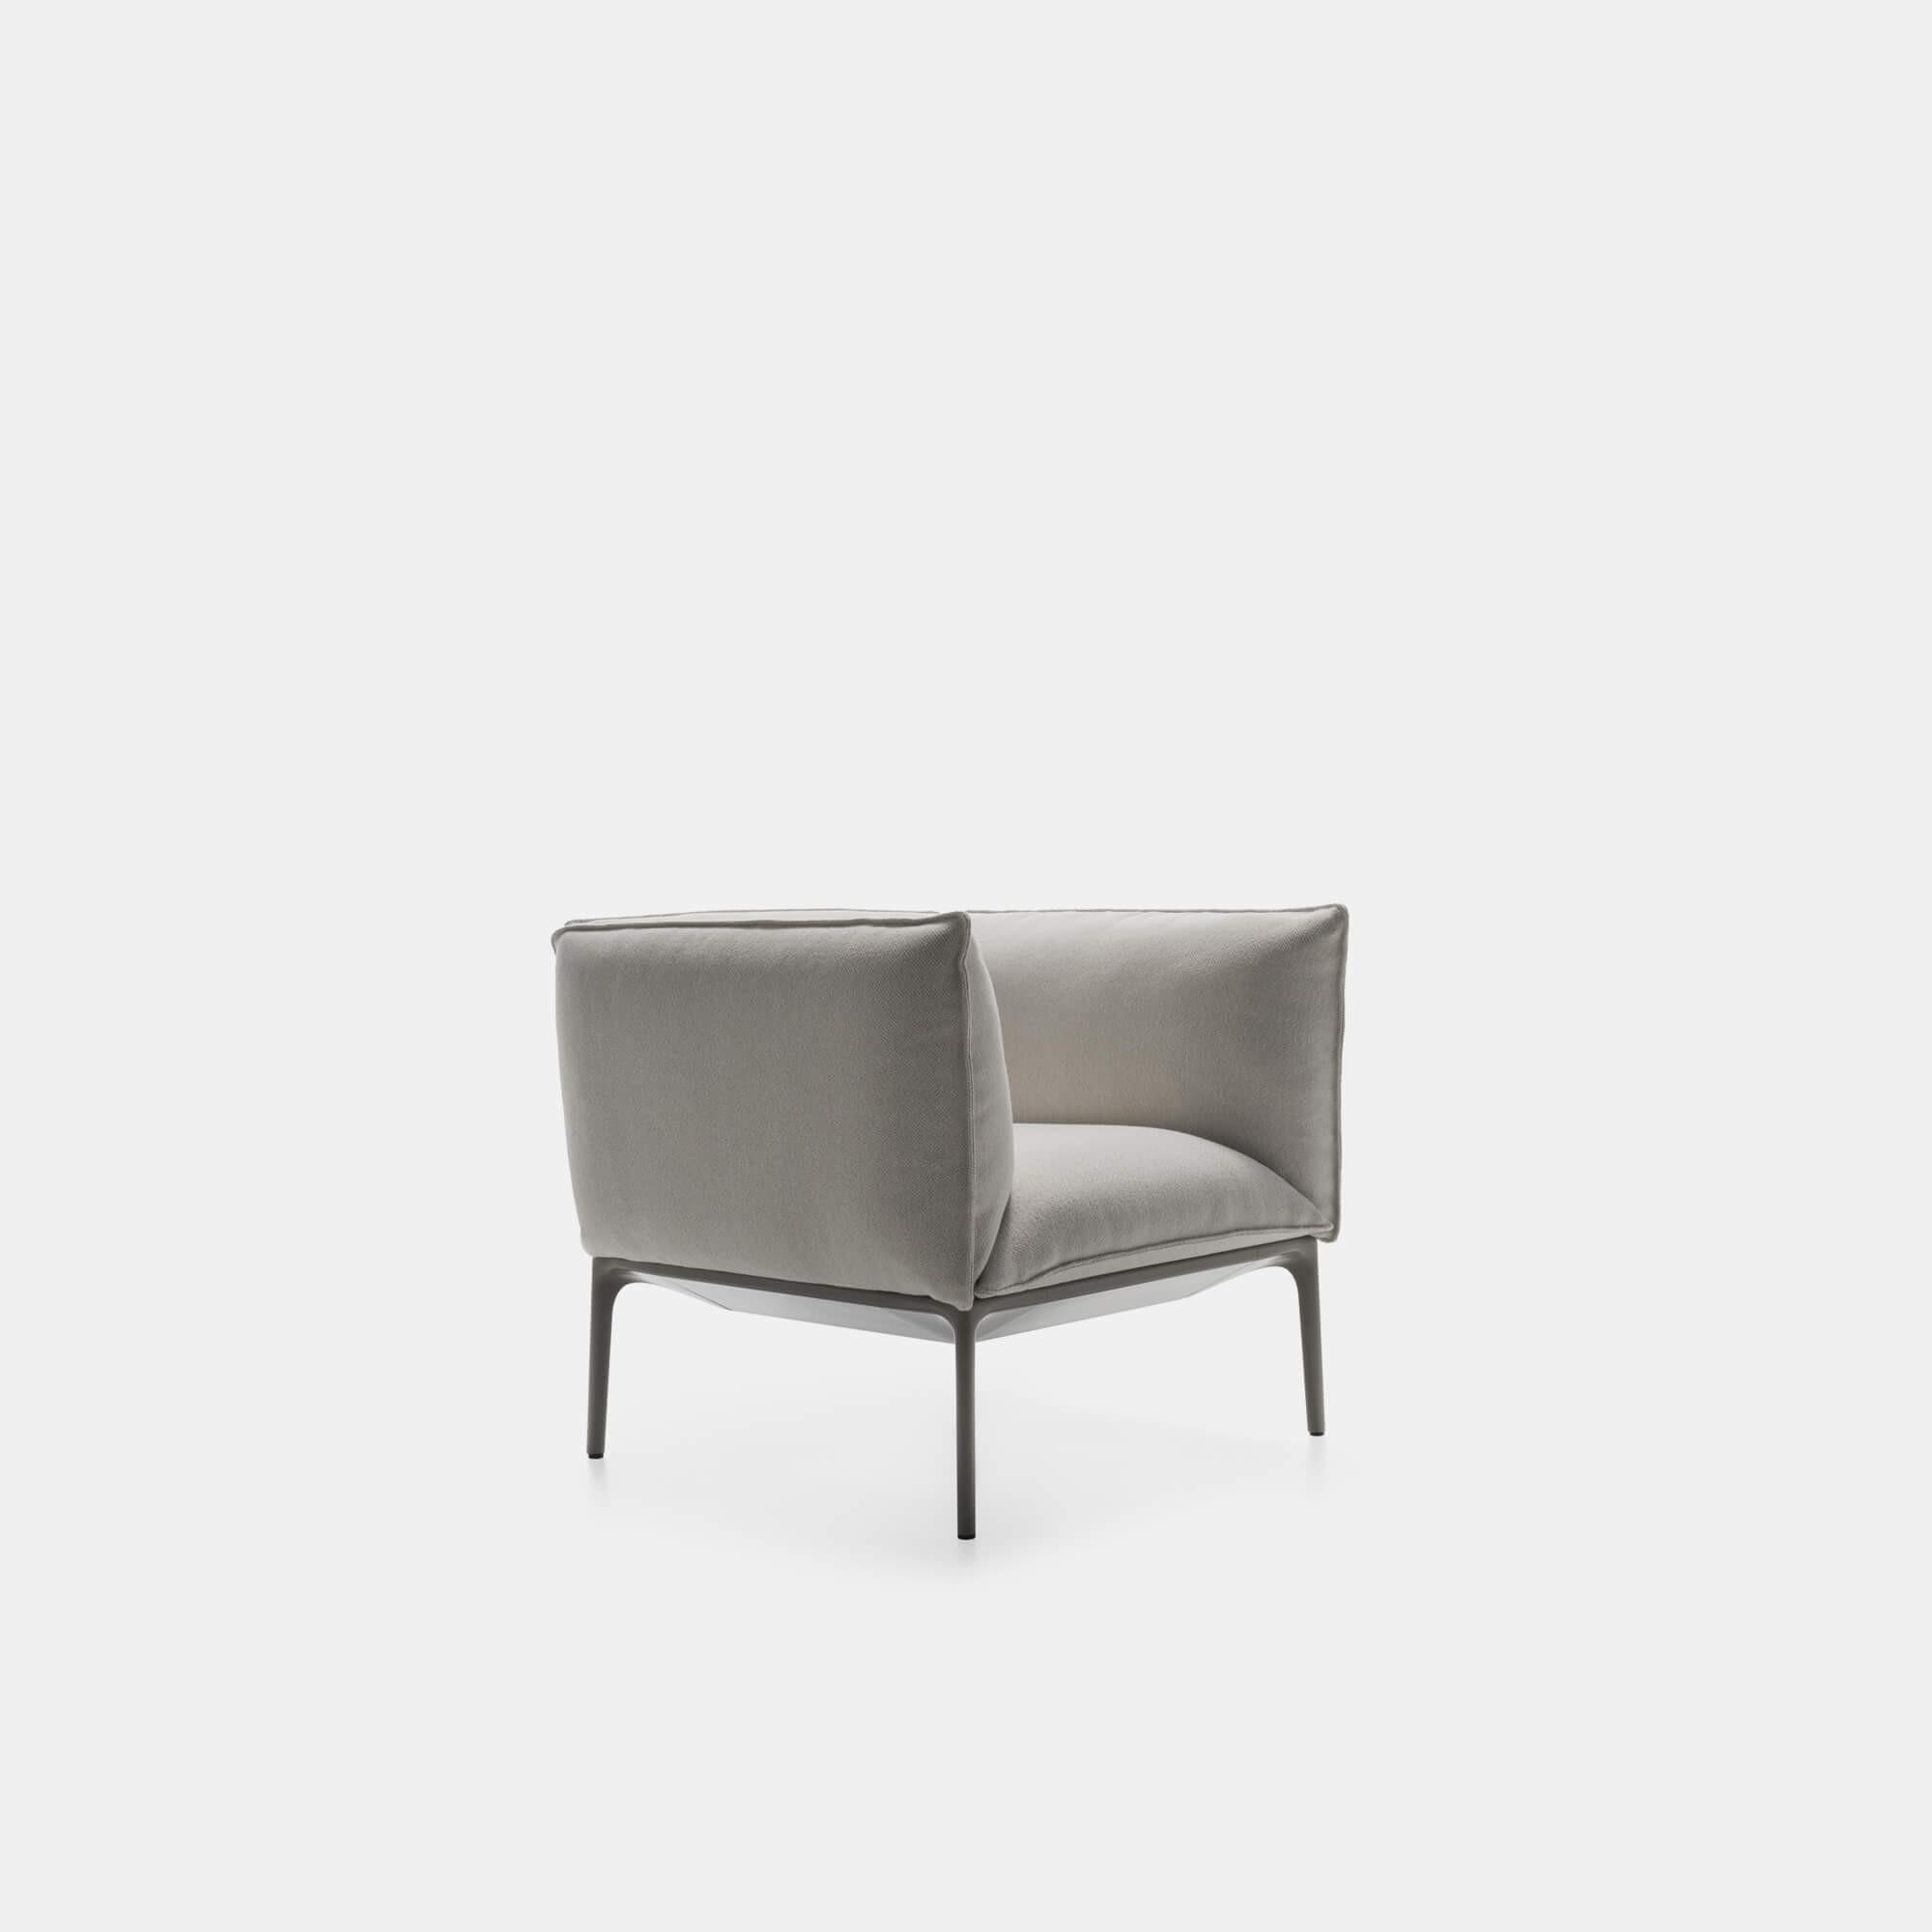 YALE X Designed by Jean Marie Massaud